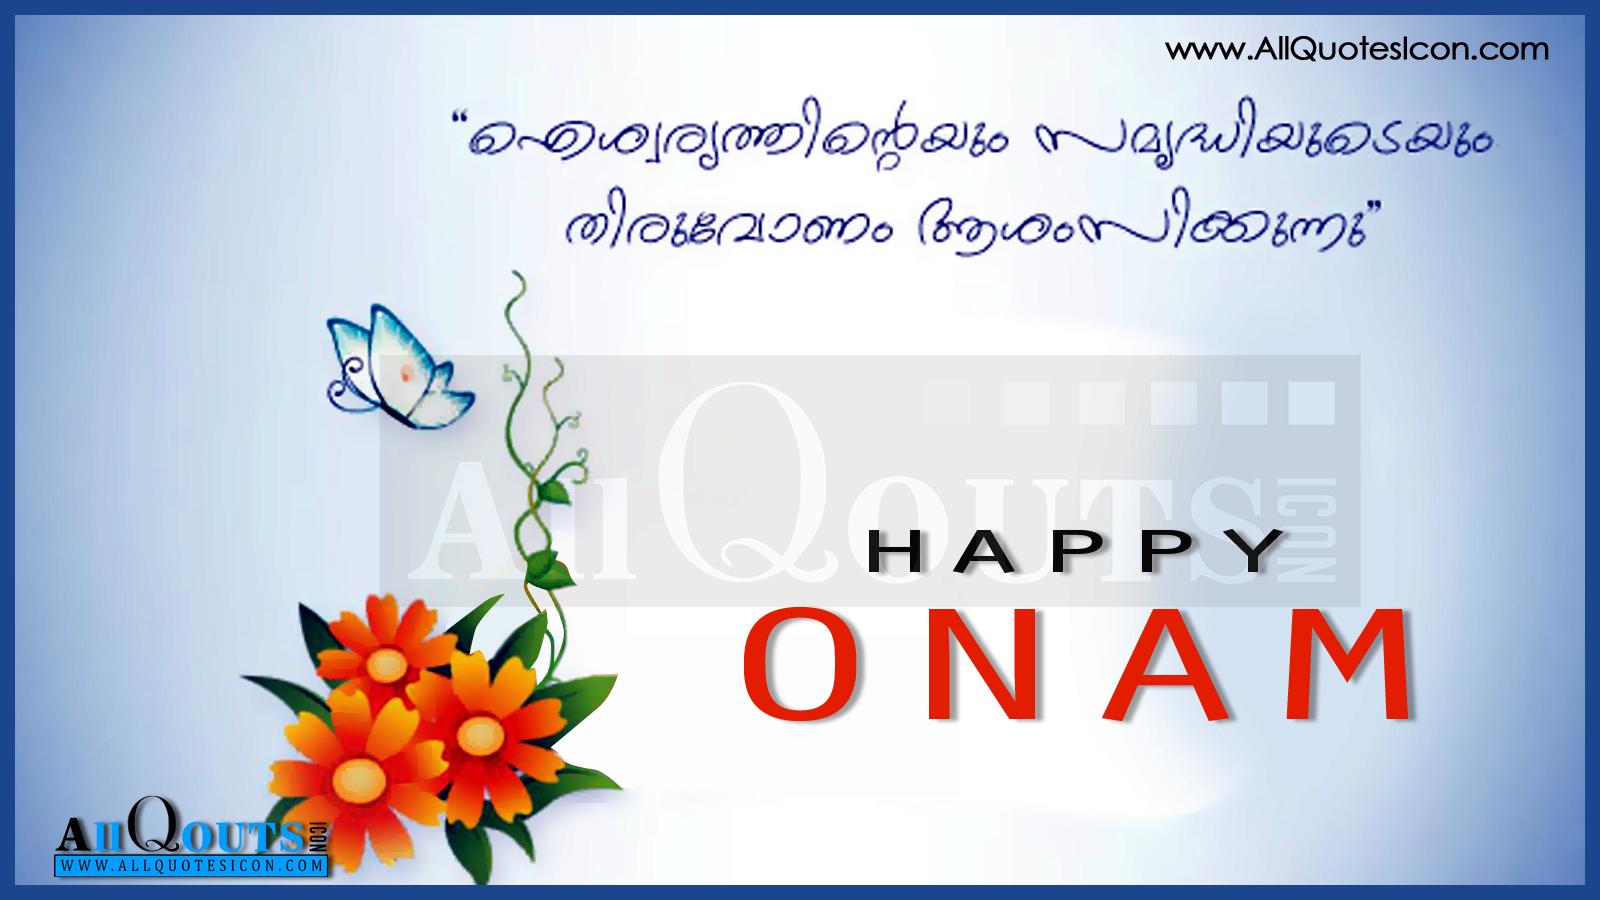 Onam wishes wallpapers many hd wallpaper onam wishes in malayalam onam ashamshagal onam hd wallpapers onam kristyandbryce Image collections